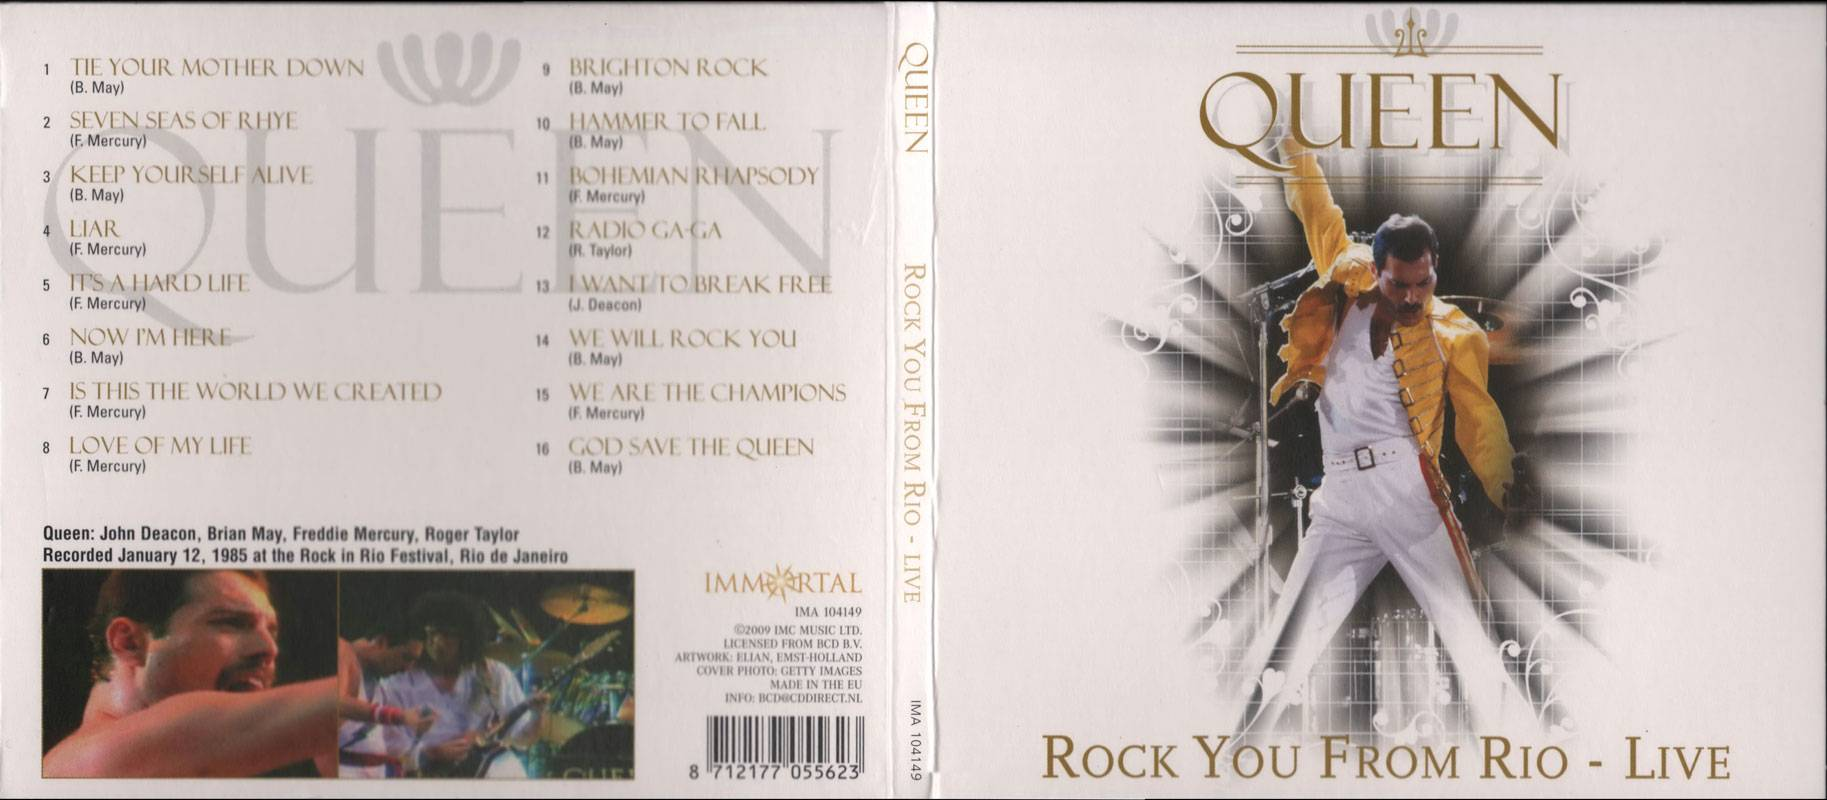 Queen - Rock You From Rio - Live (2009) / AvaxHome